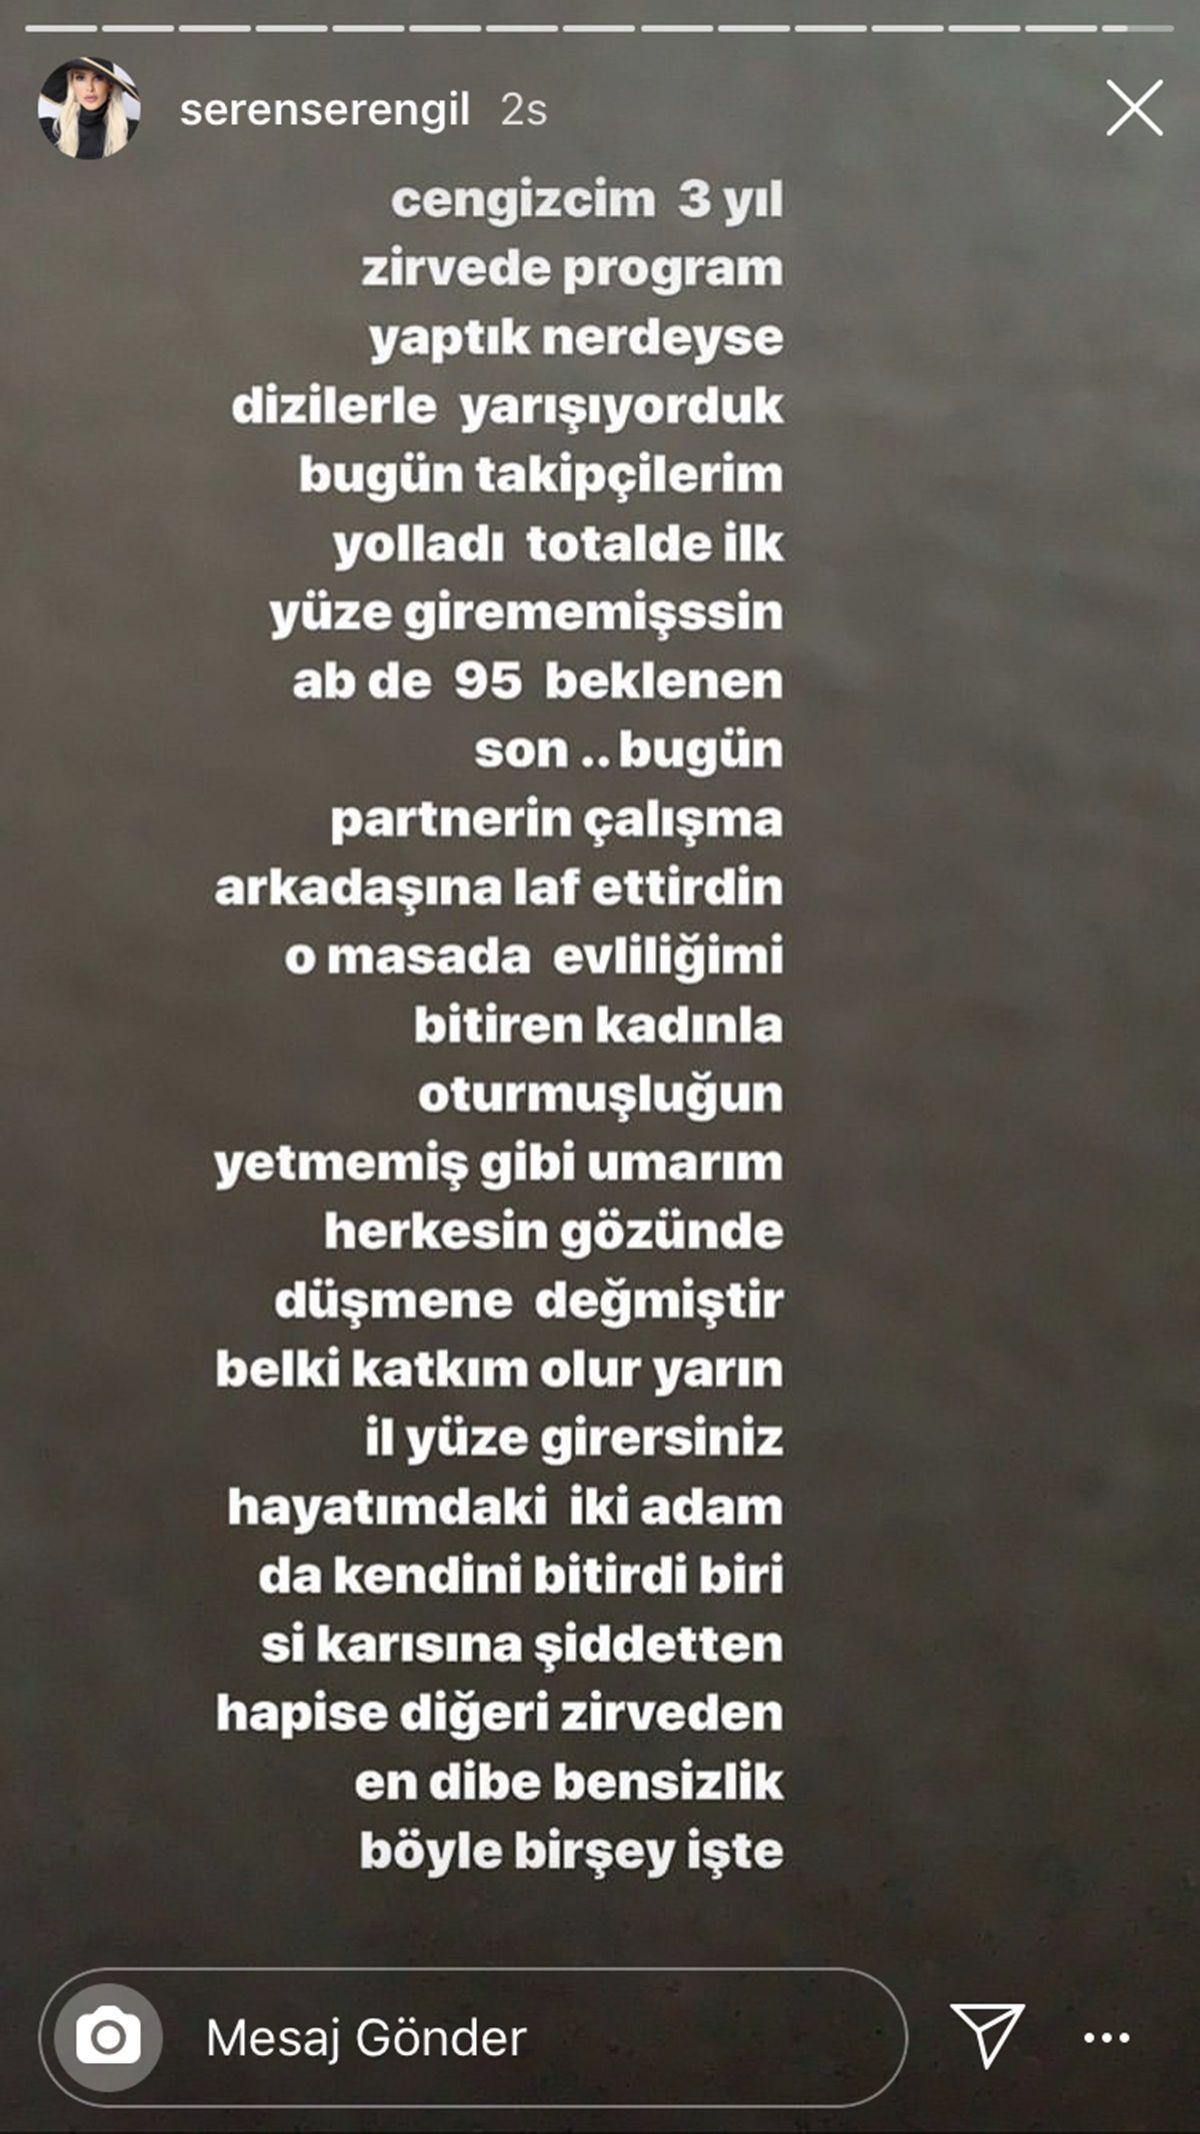 Seren Serengil Cengiz Semercioğlu'nu yerden yere vurdu dostluğu Eylem İpek bitirdi